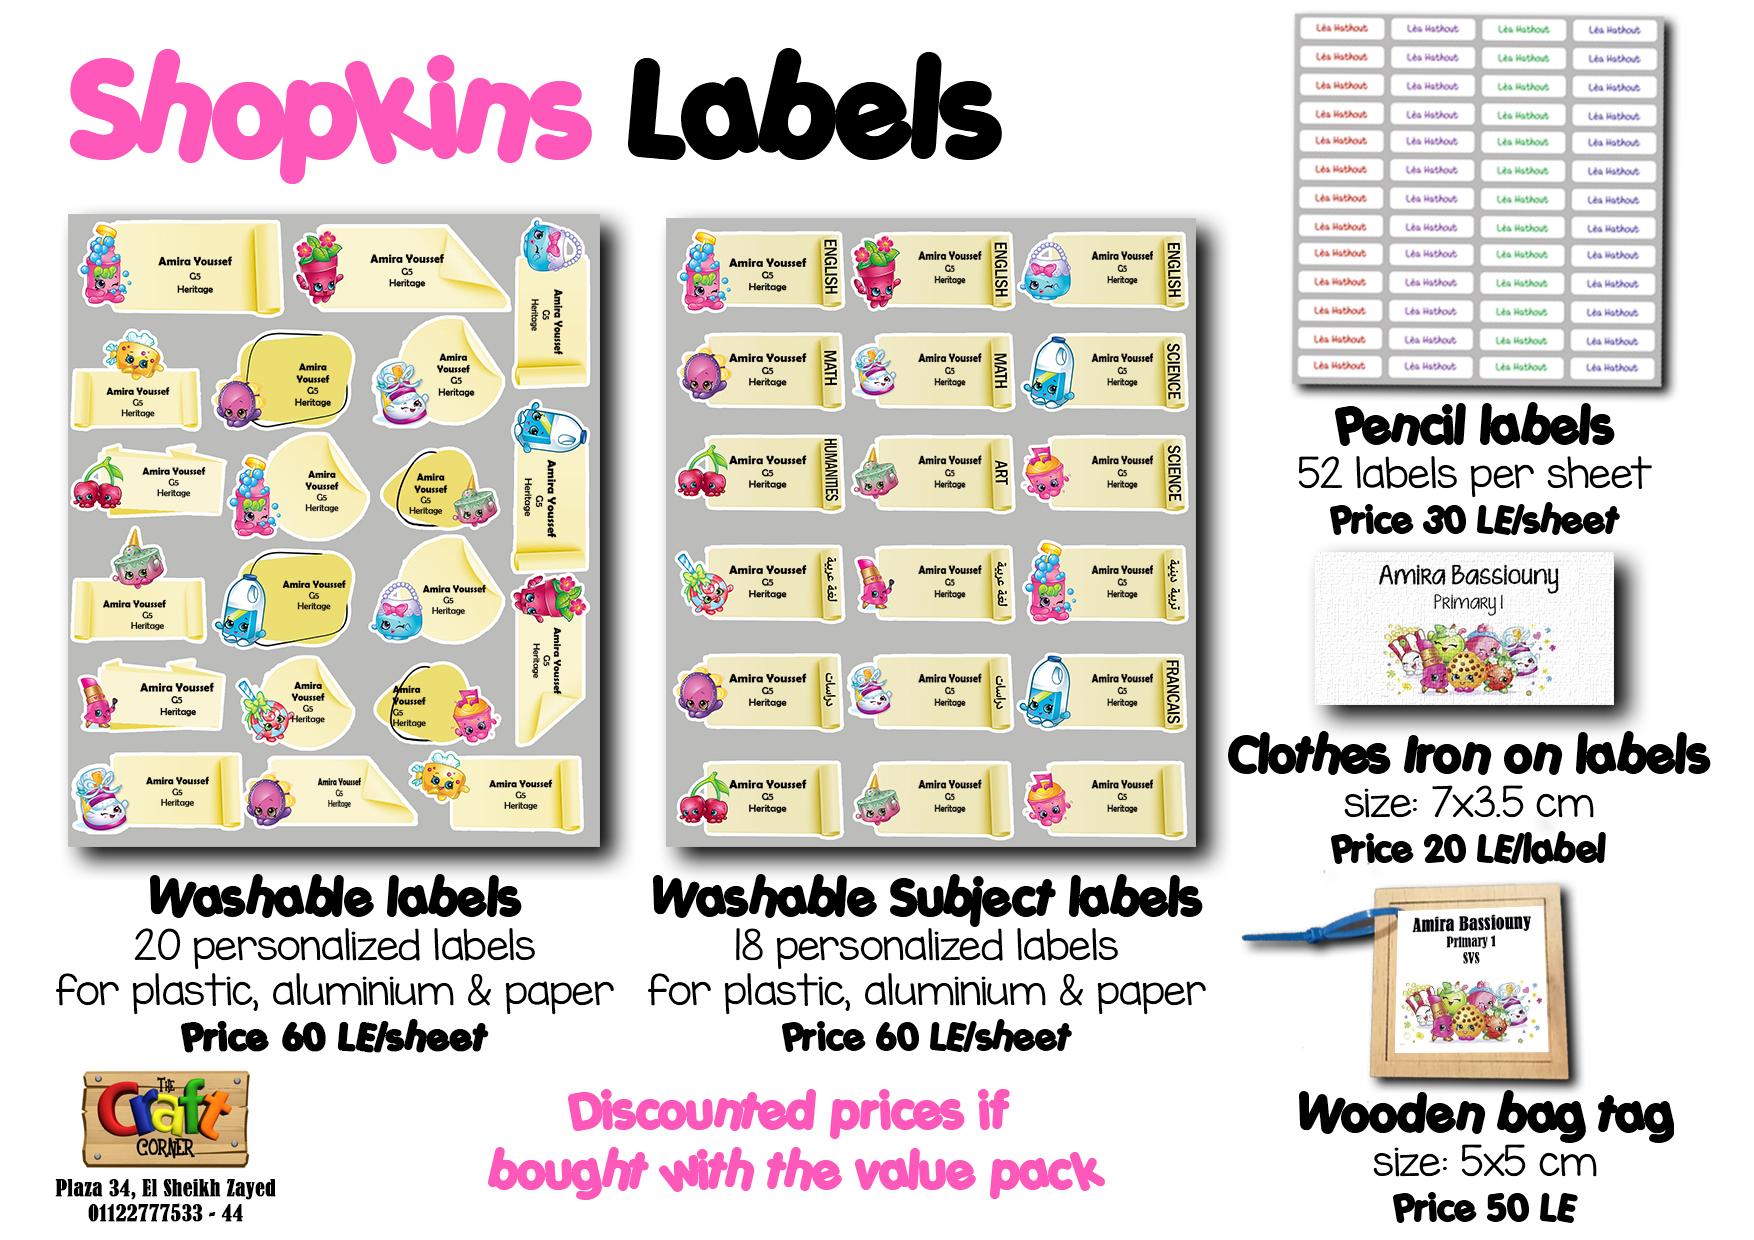 shopkins Labels